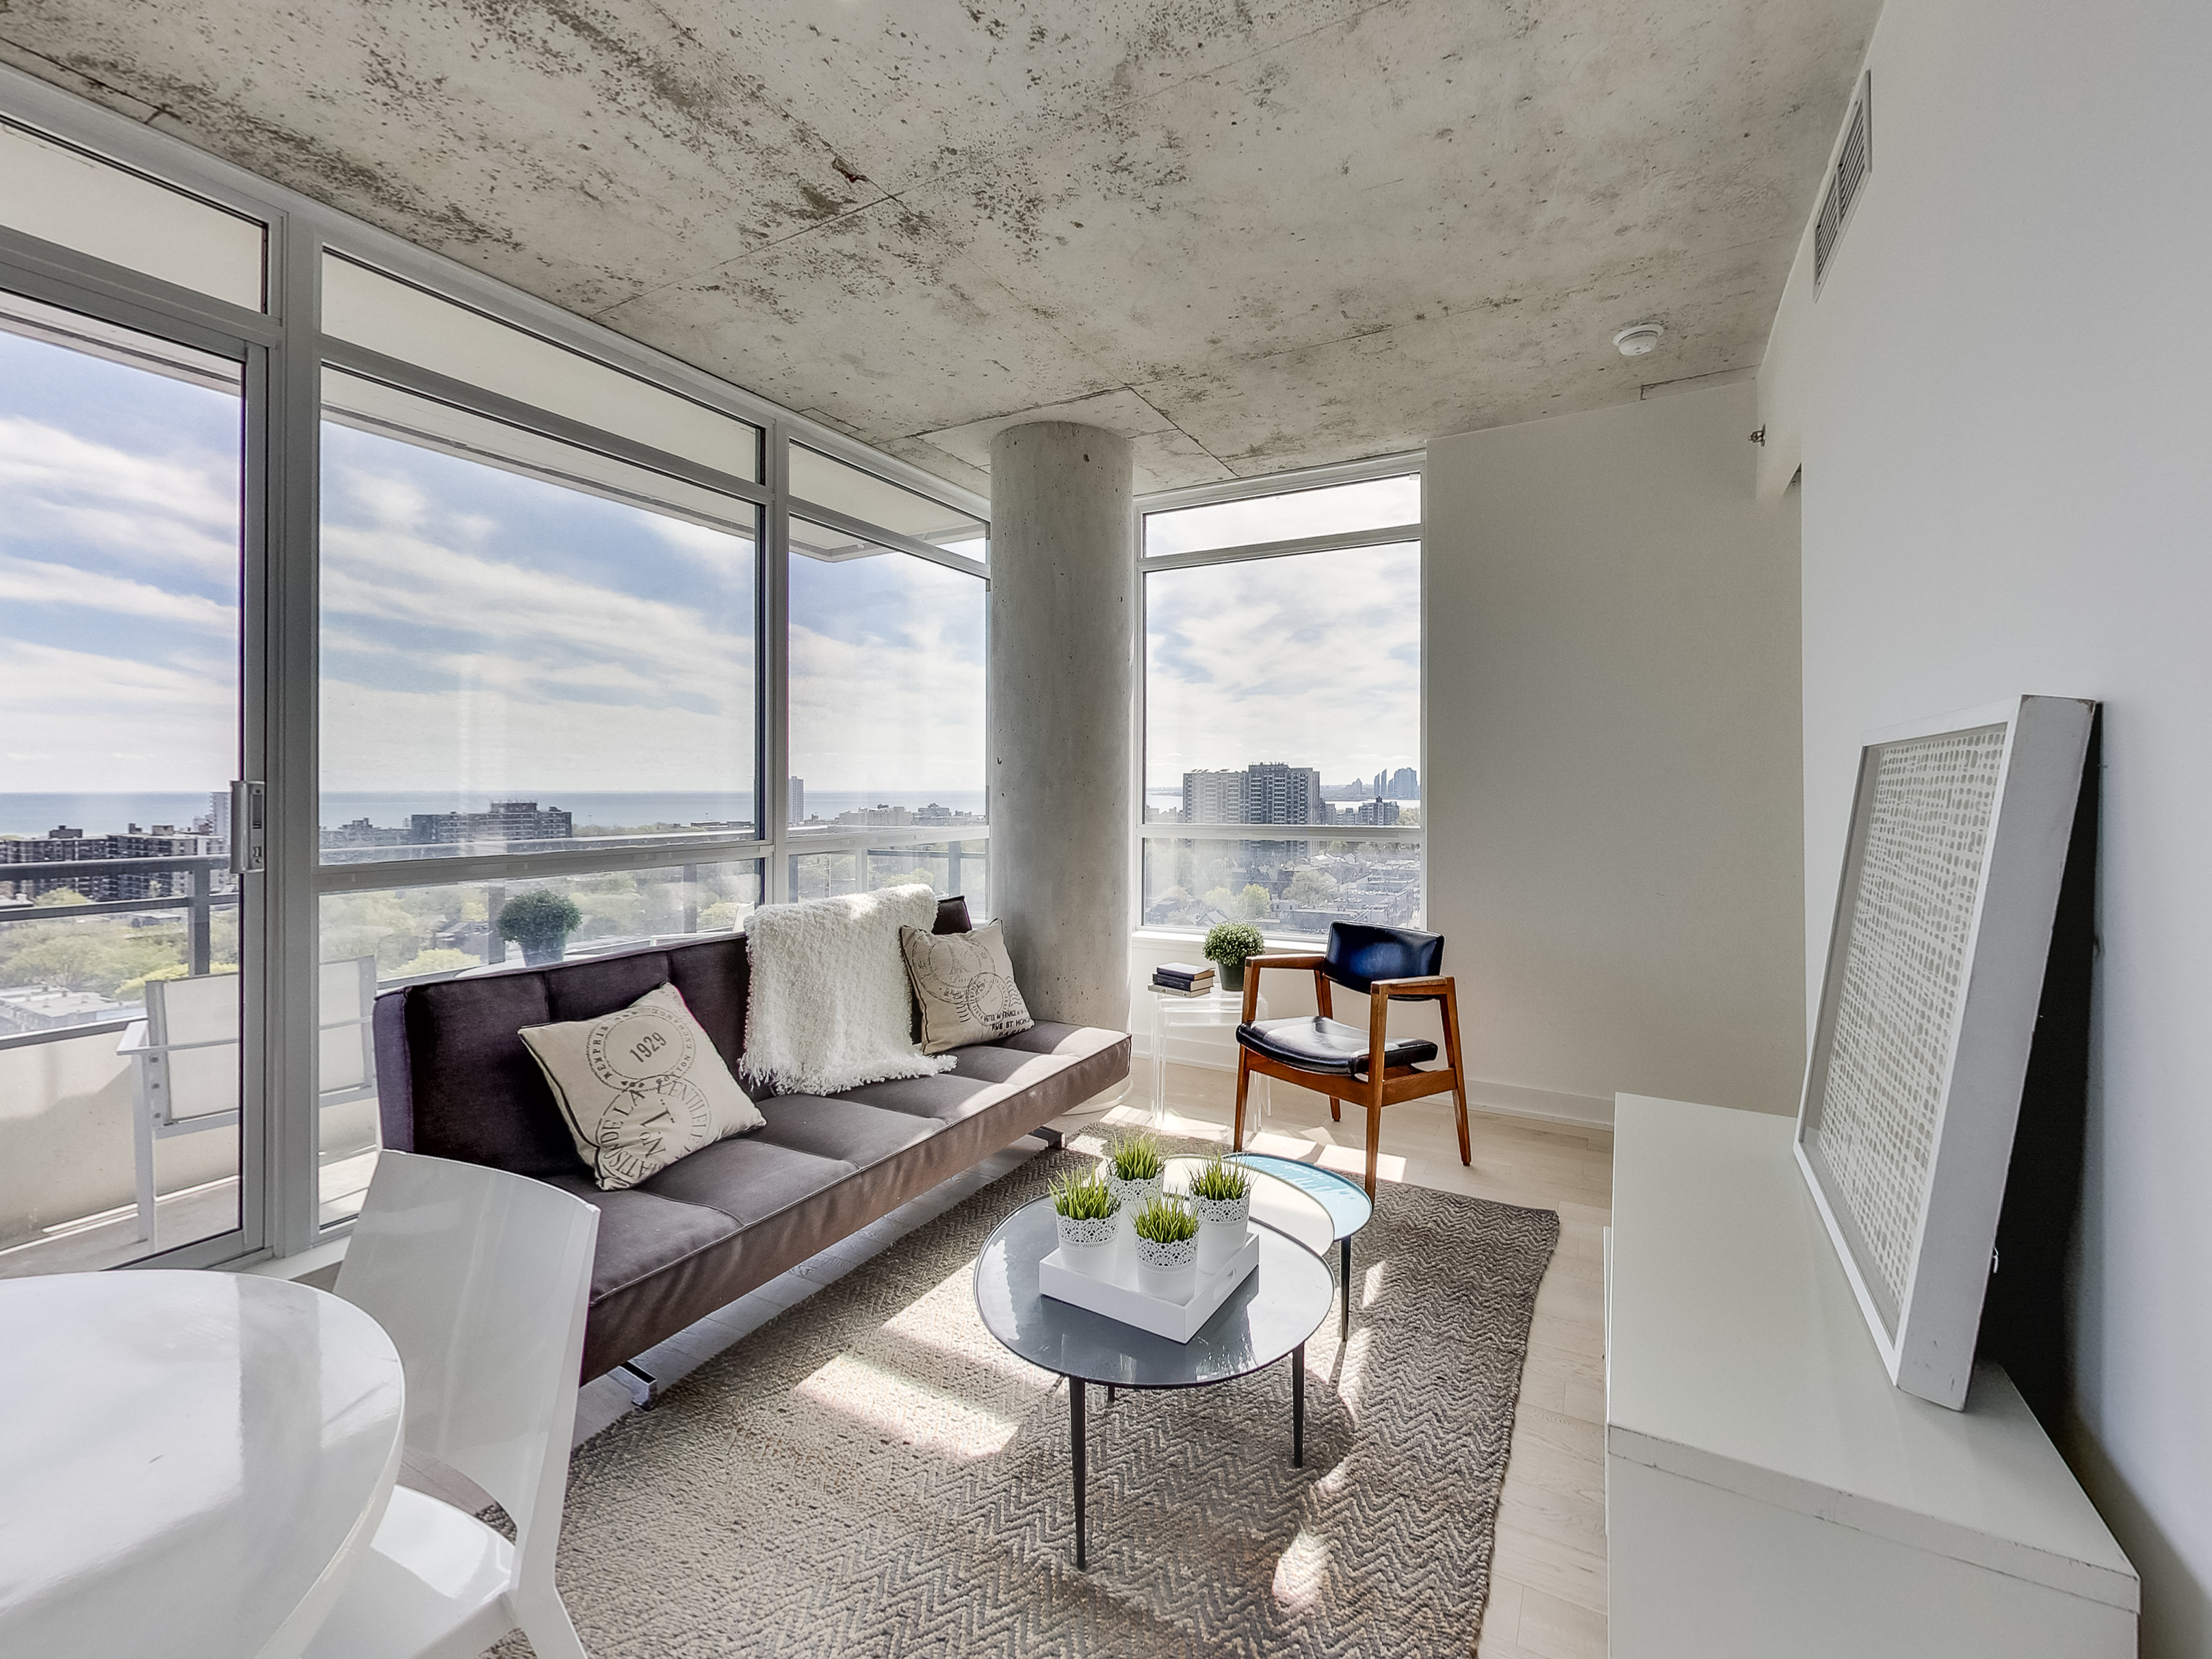 lake view condo in Toronto with modern furniture